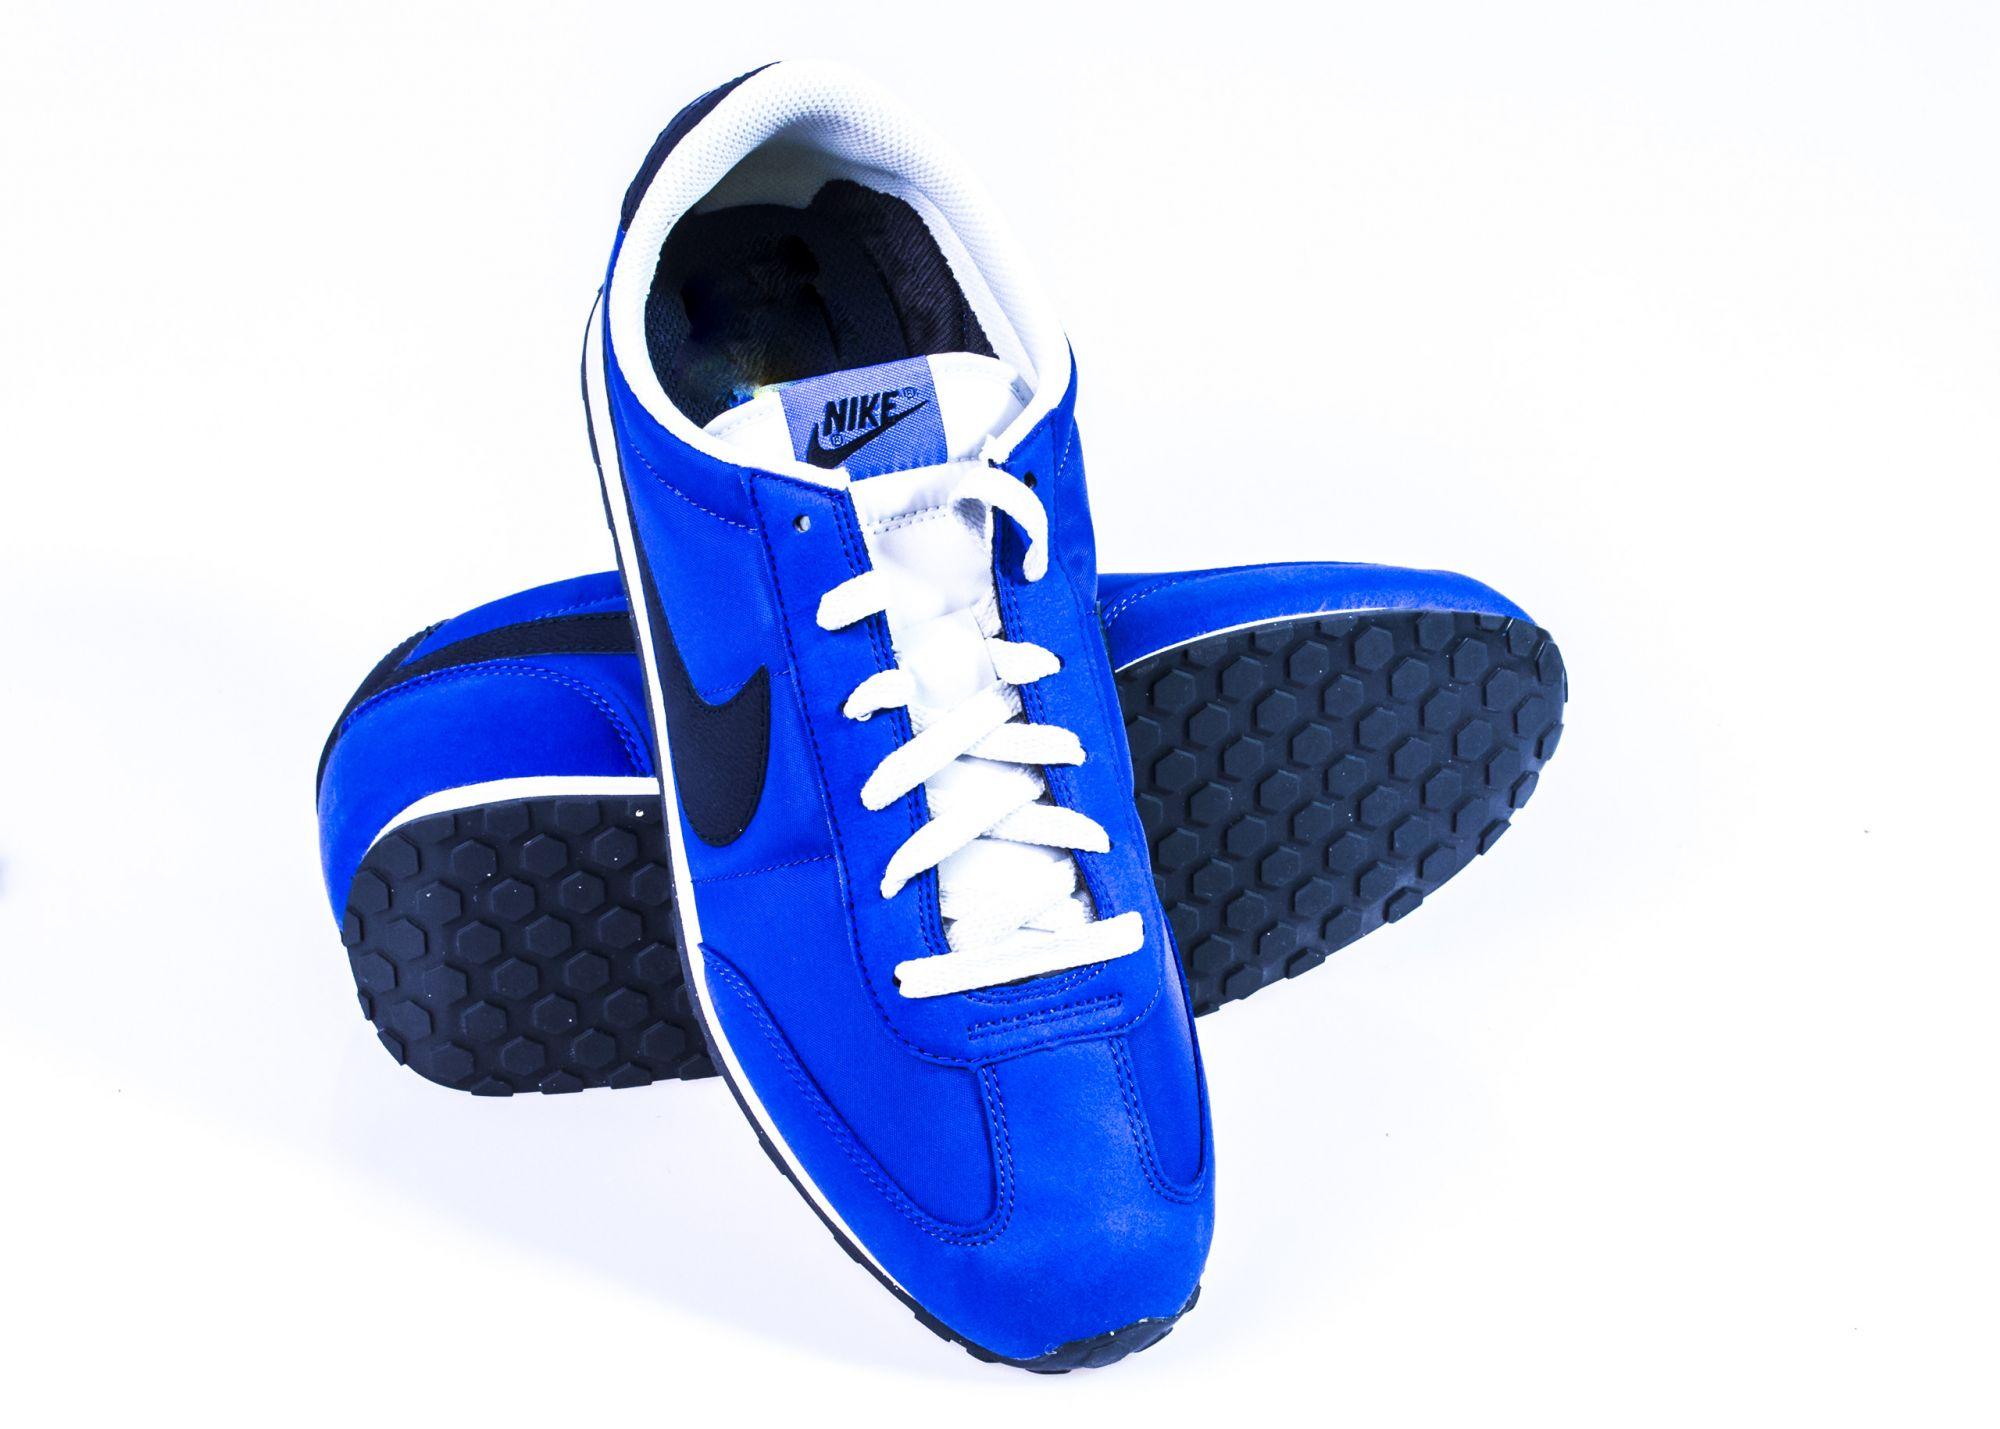 san francisco 36896 c0179 Nike Mach Runner Buty Męskie ! SUPER Promocja!